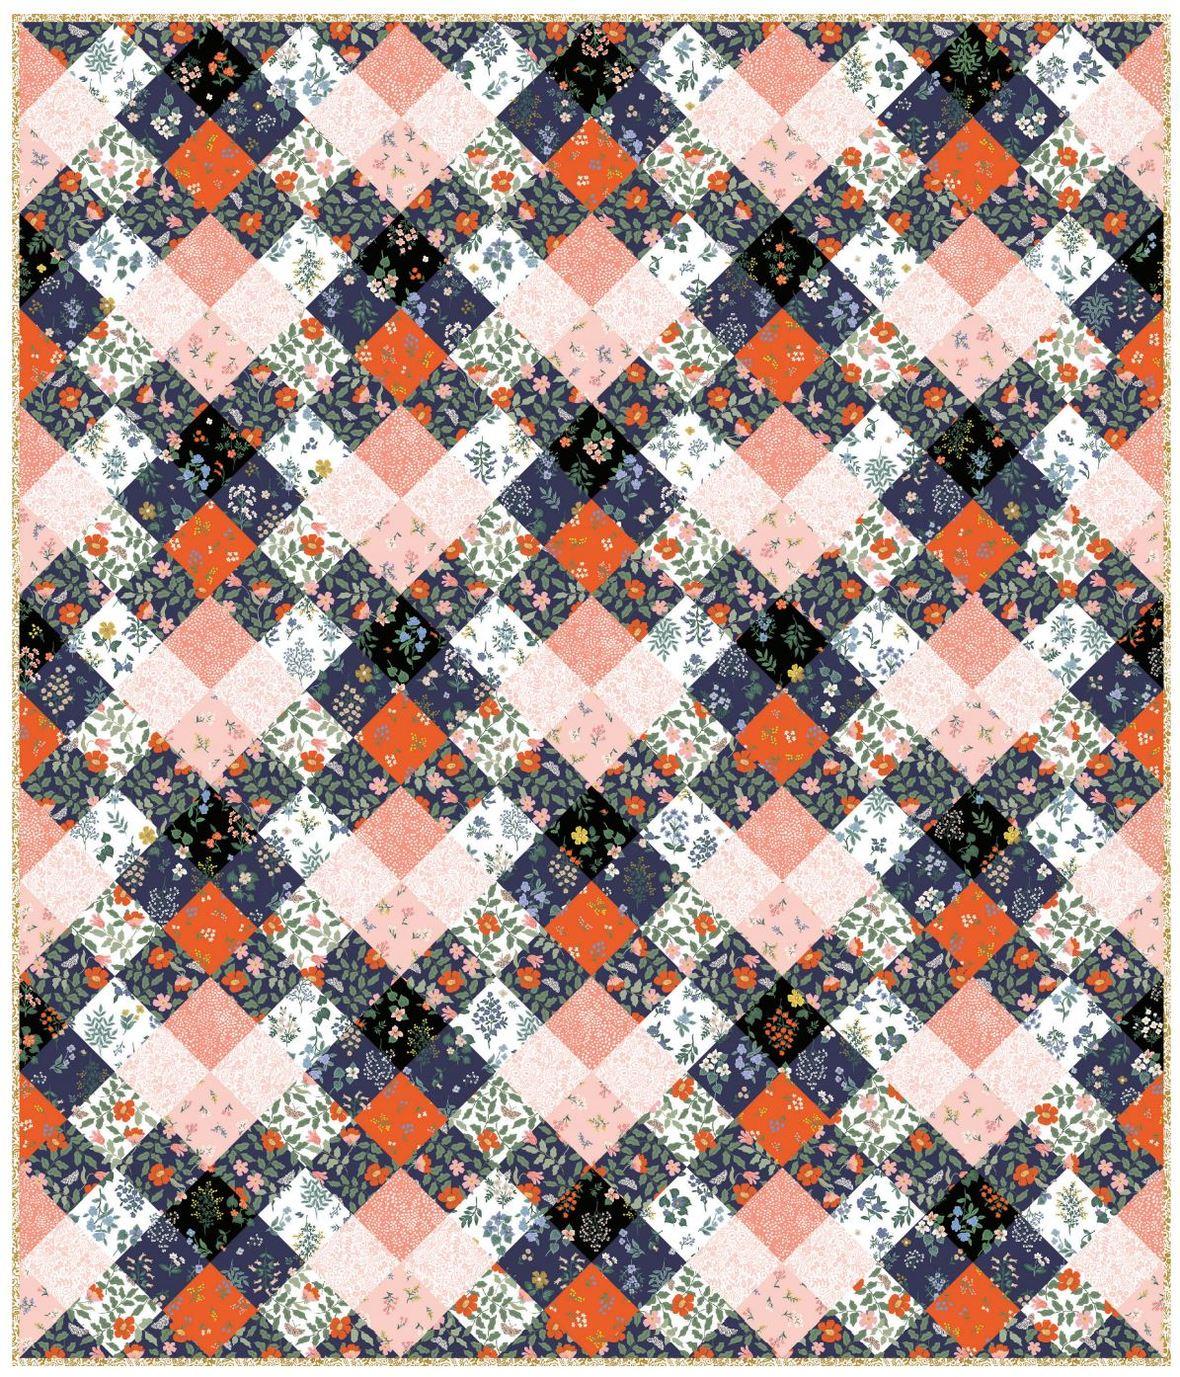 Catalog Strawberry Fields Quilt 2